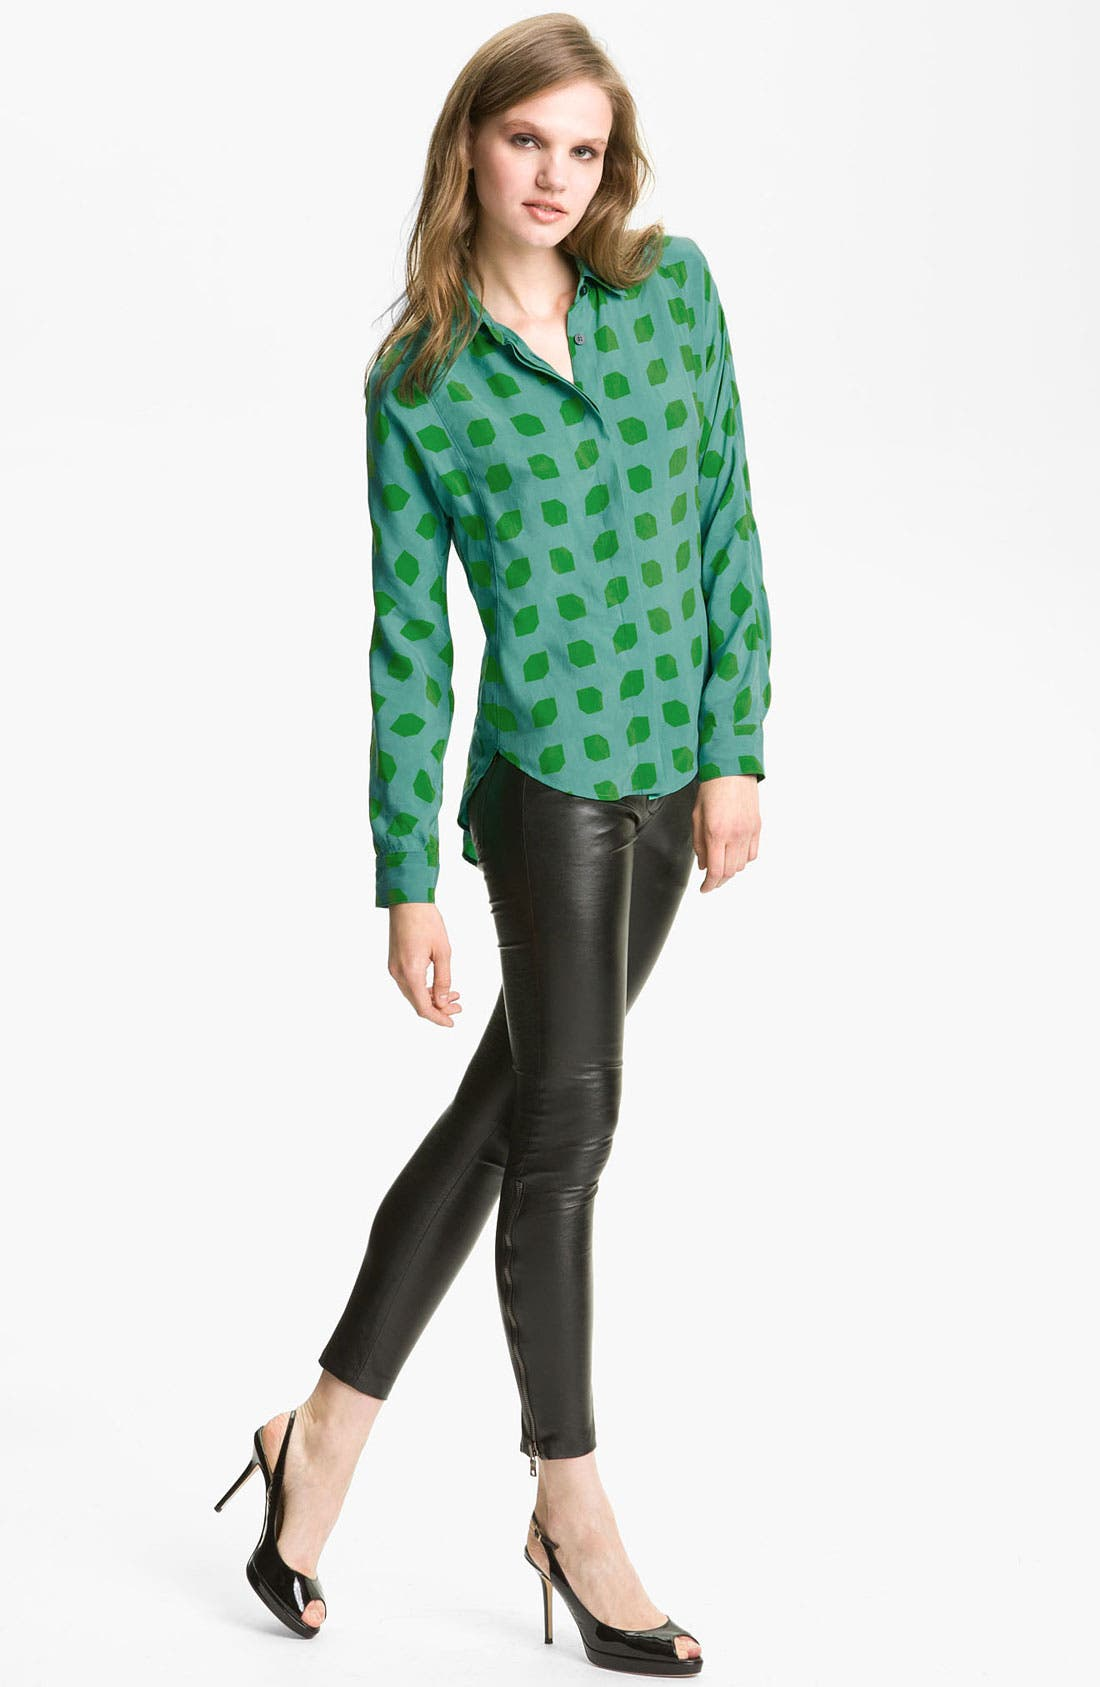 Alternate Image 1 Selected - Kelly Wearstler 'Hutton' Print Shirt